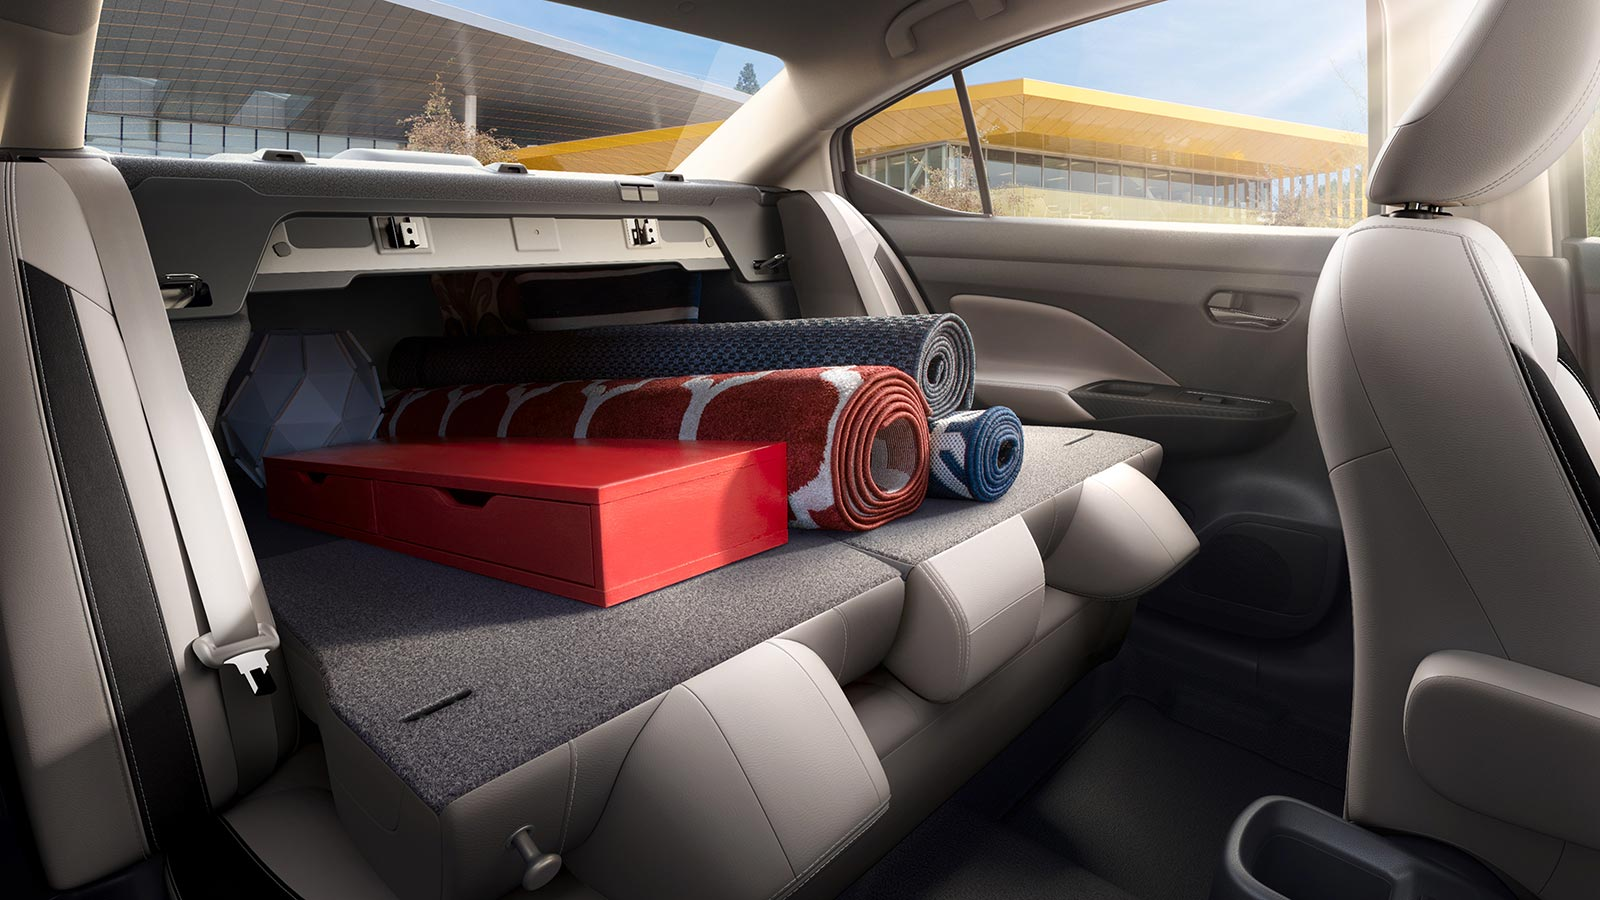 Baúl Nuevo Nissan Versa